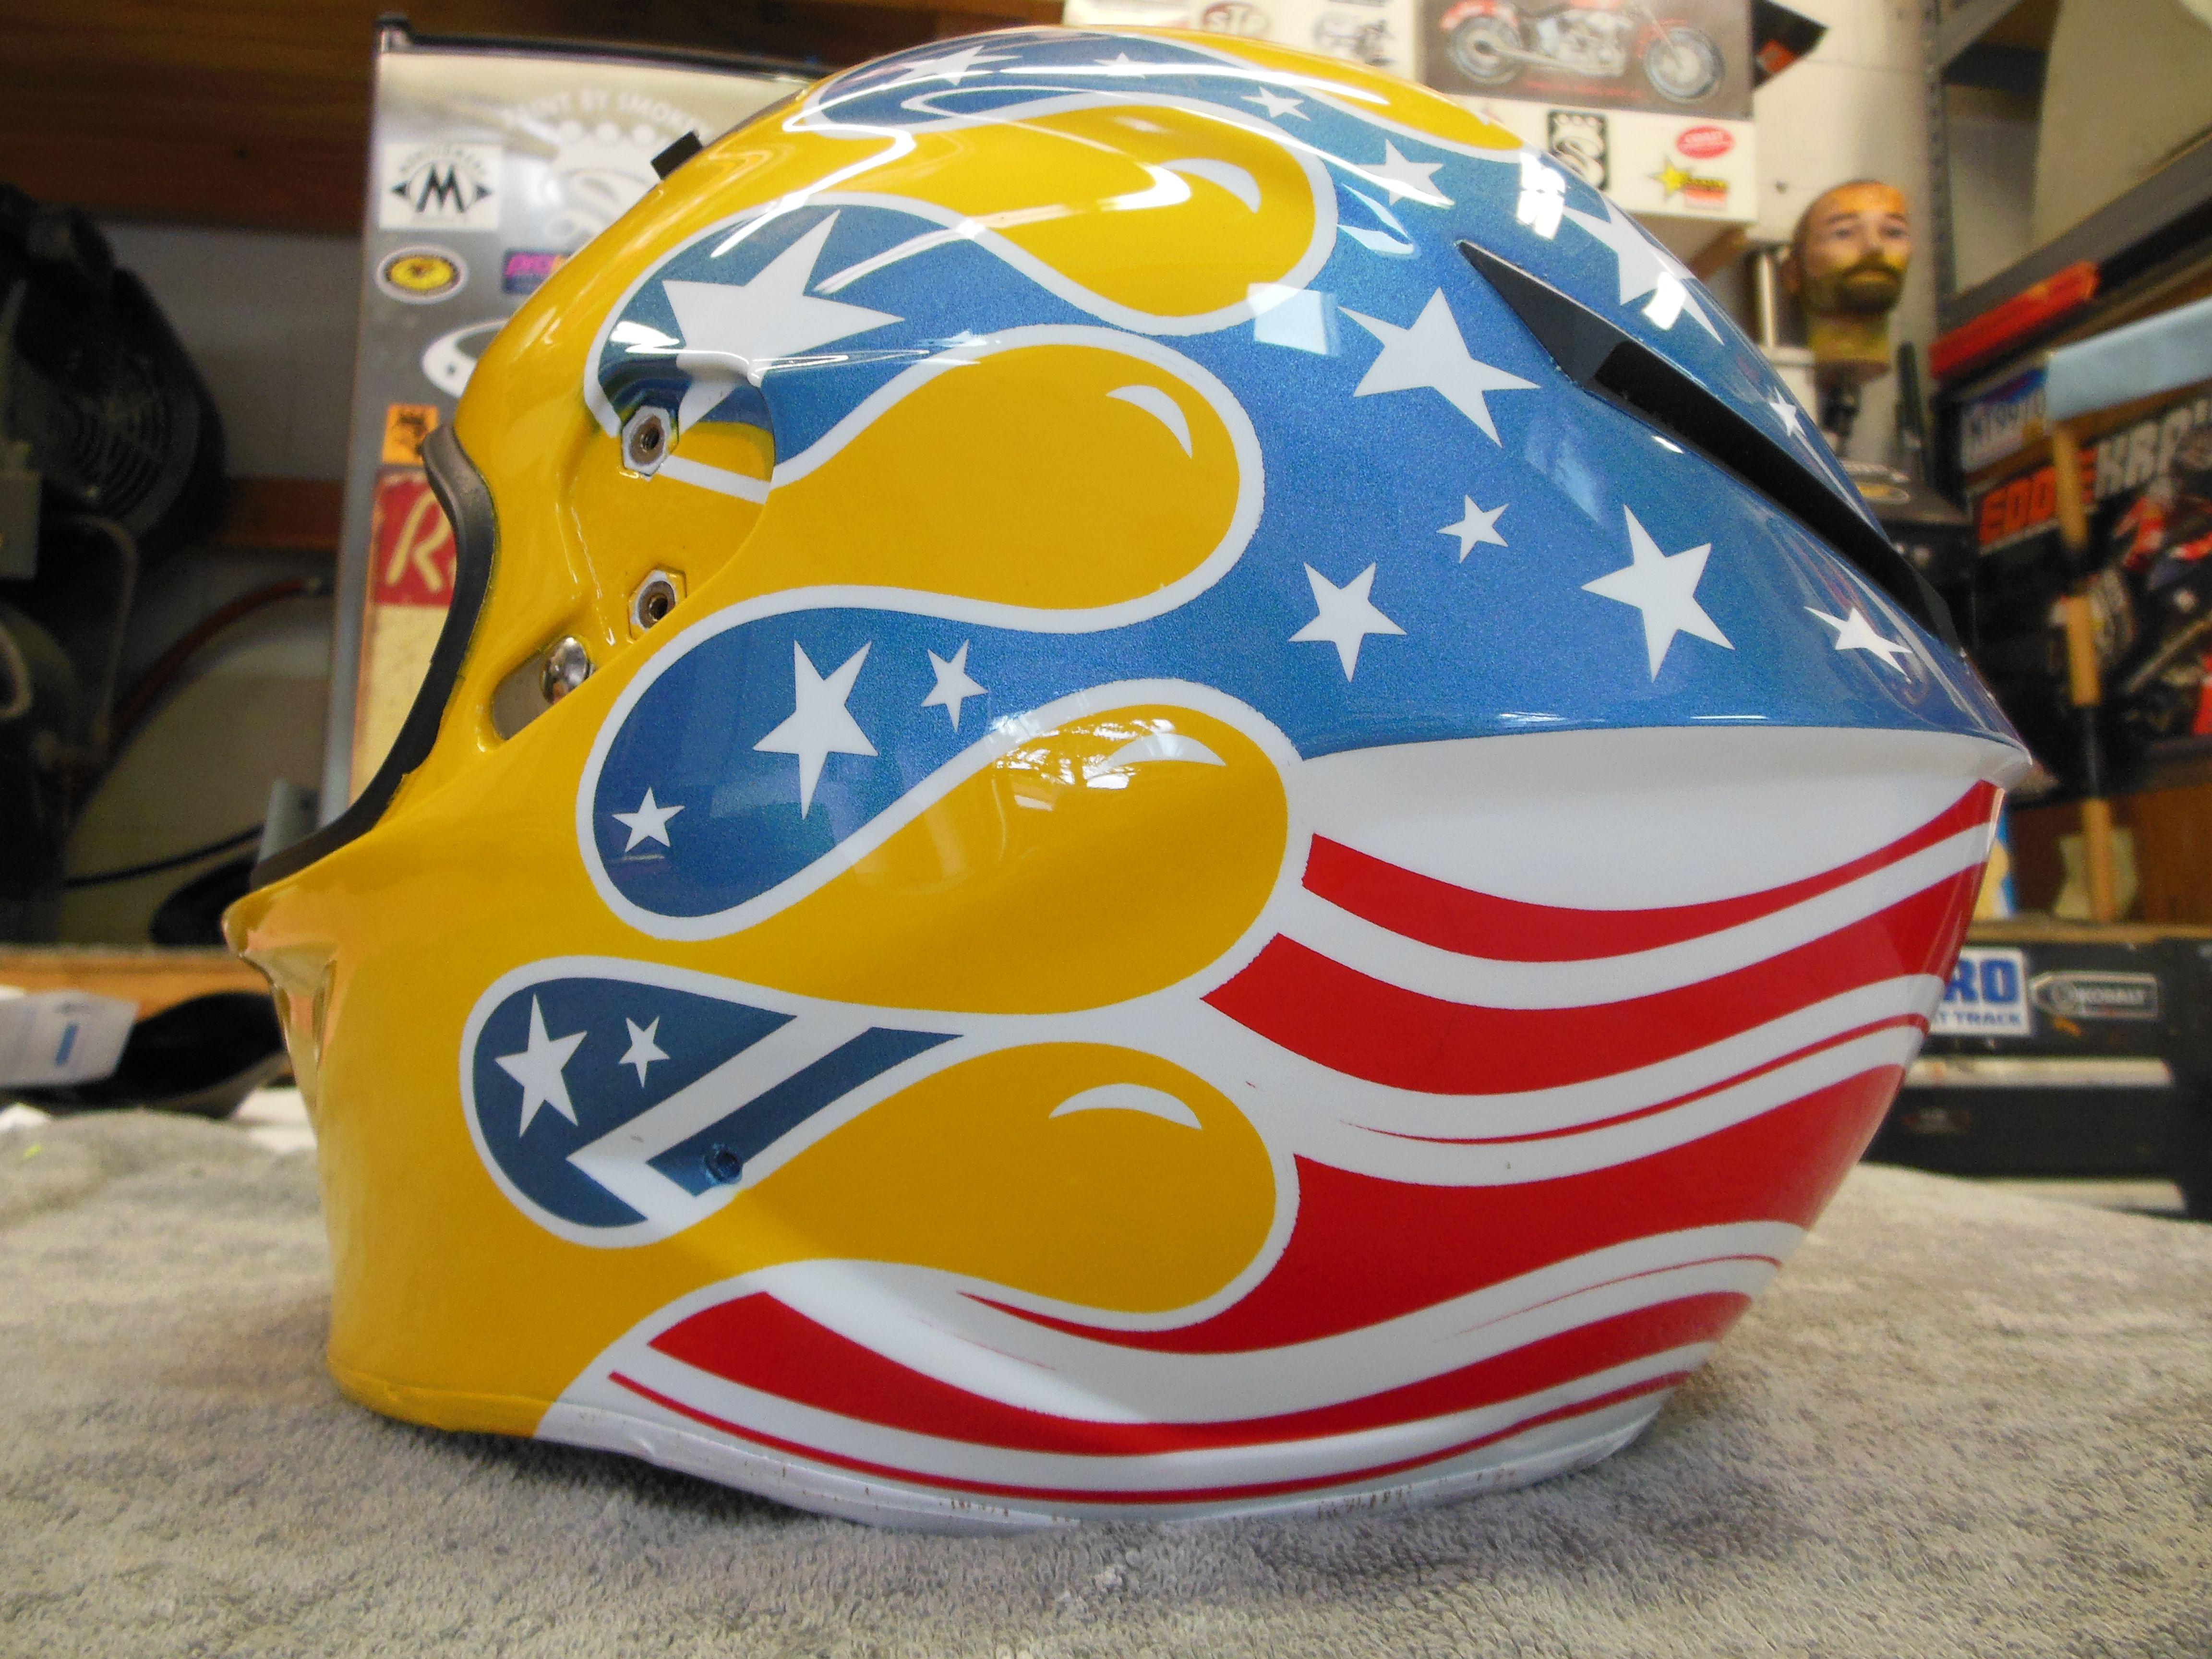 Phil Occonor Custom Painted American Flag Cartoon Paint Drip Full - Motorcycle helmet decals militarysubdued american flag sticker military tactical usa helmet decal